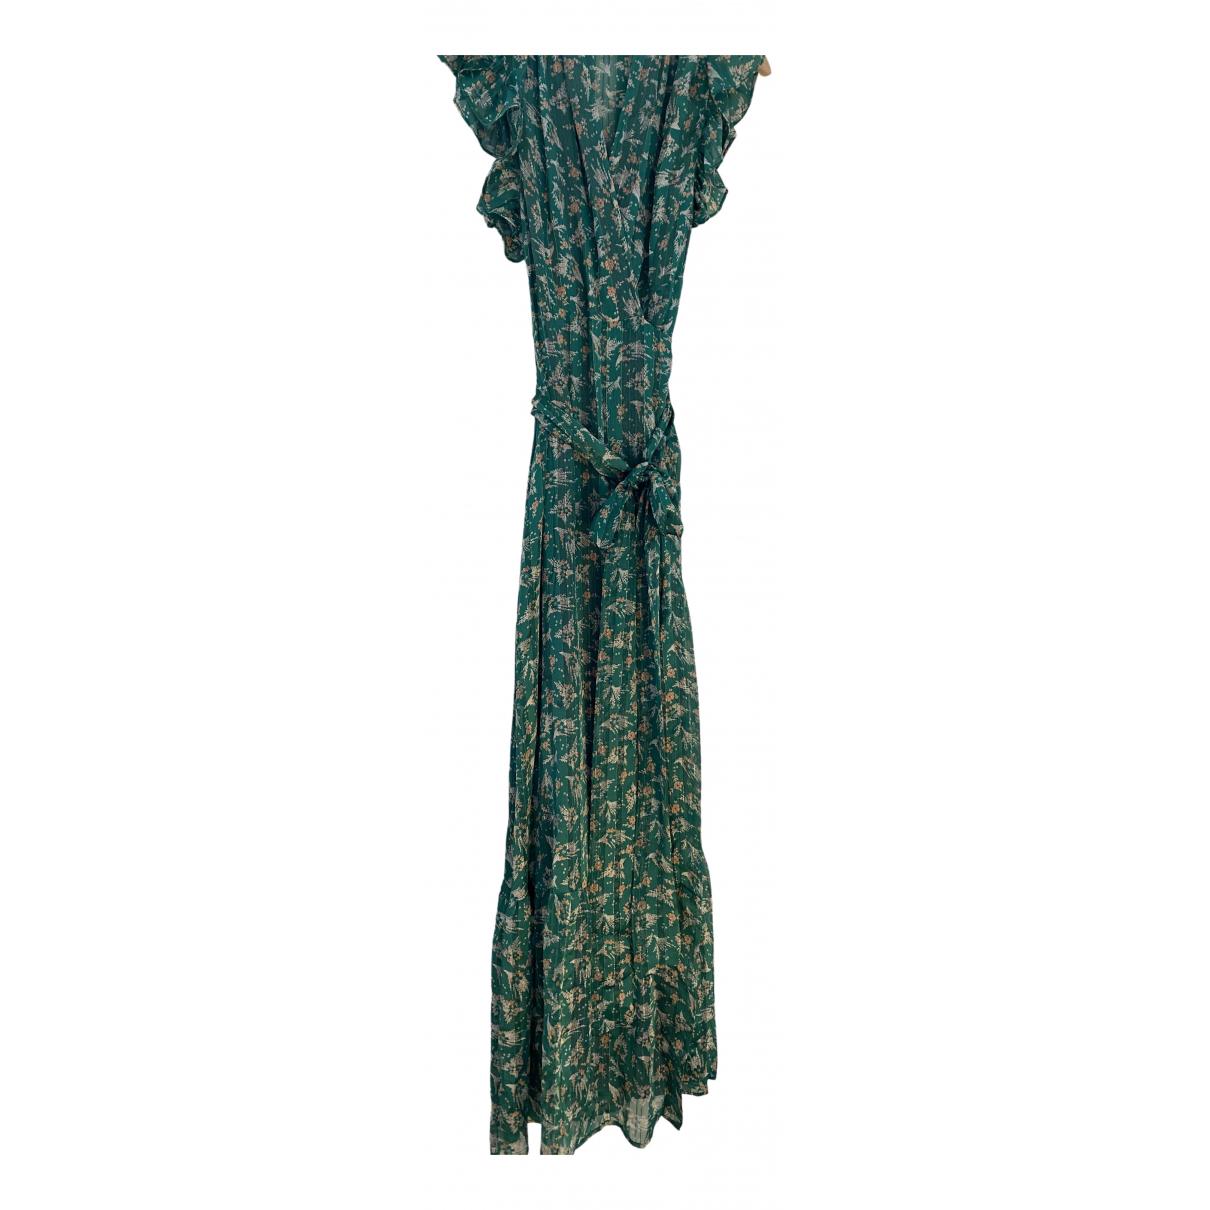 Jane Wood N Green dress for Women 36 FR